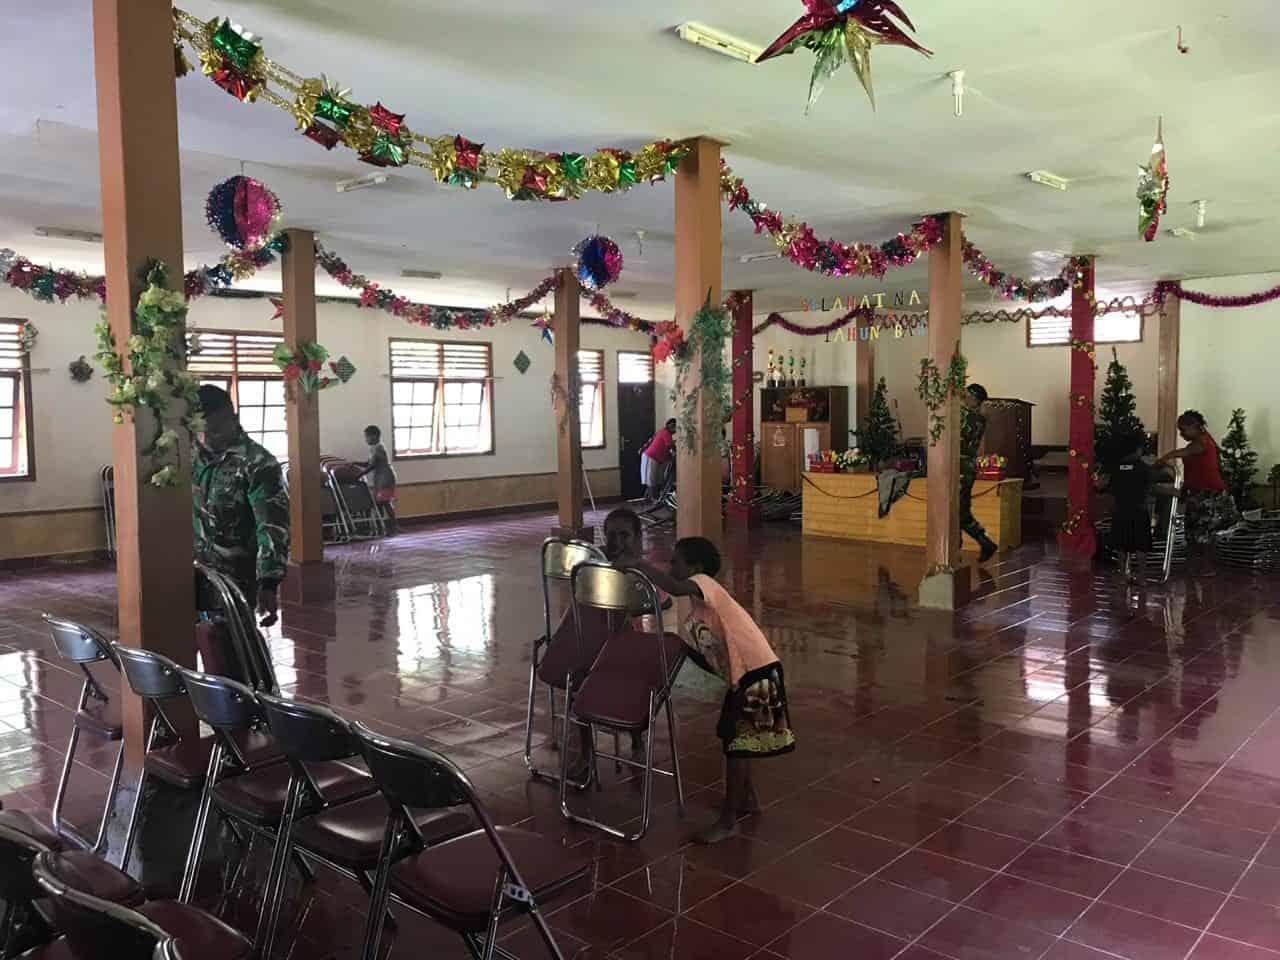 Perkuat Kebersamaan, Satgas Yonif 754 Bersih-Bersih Tempat Ibadah